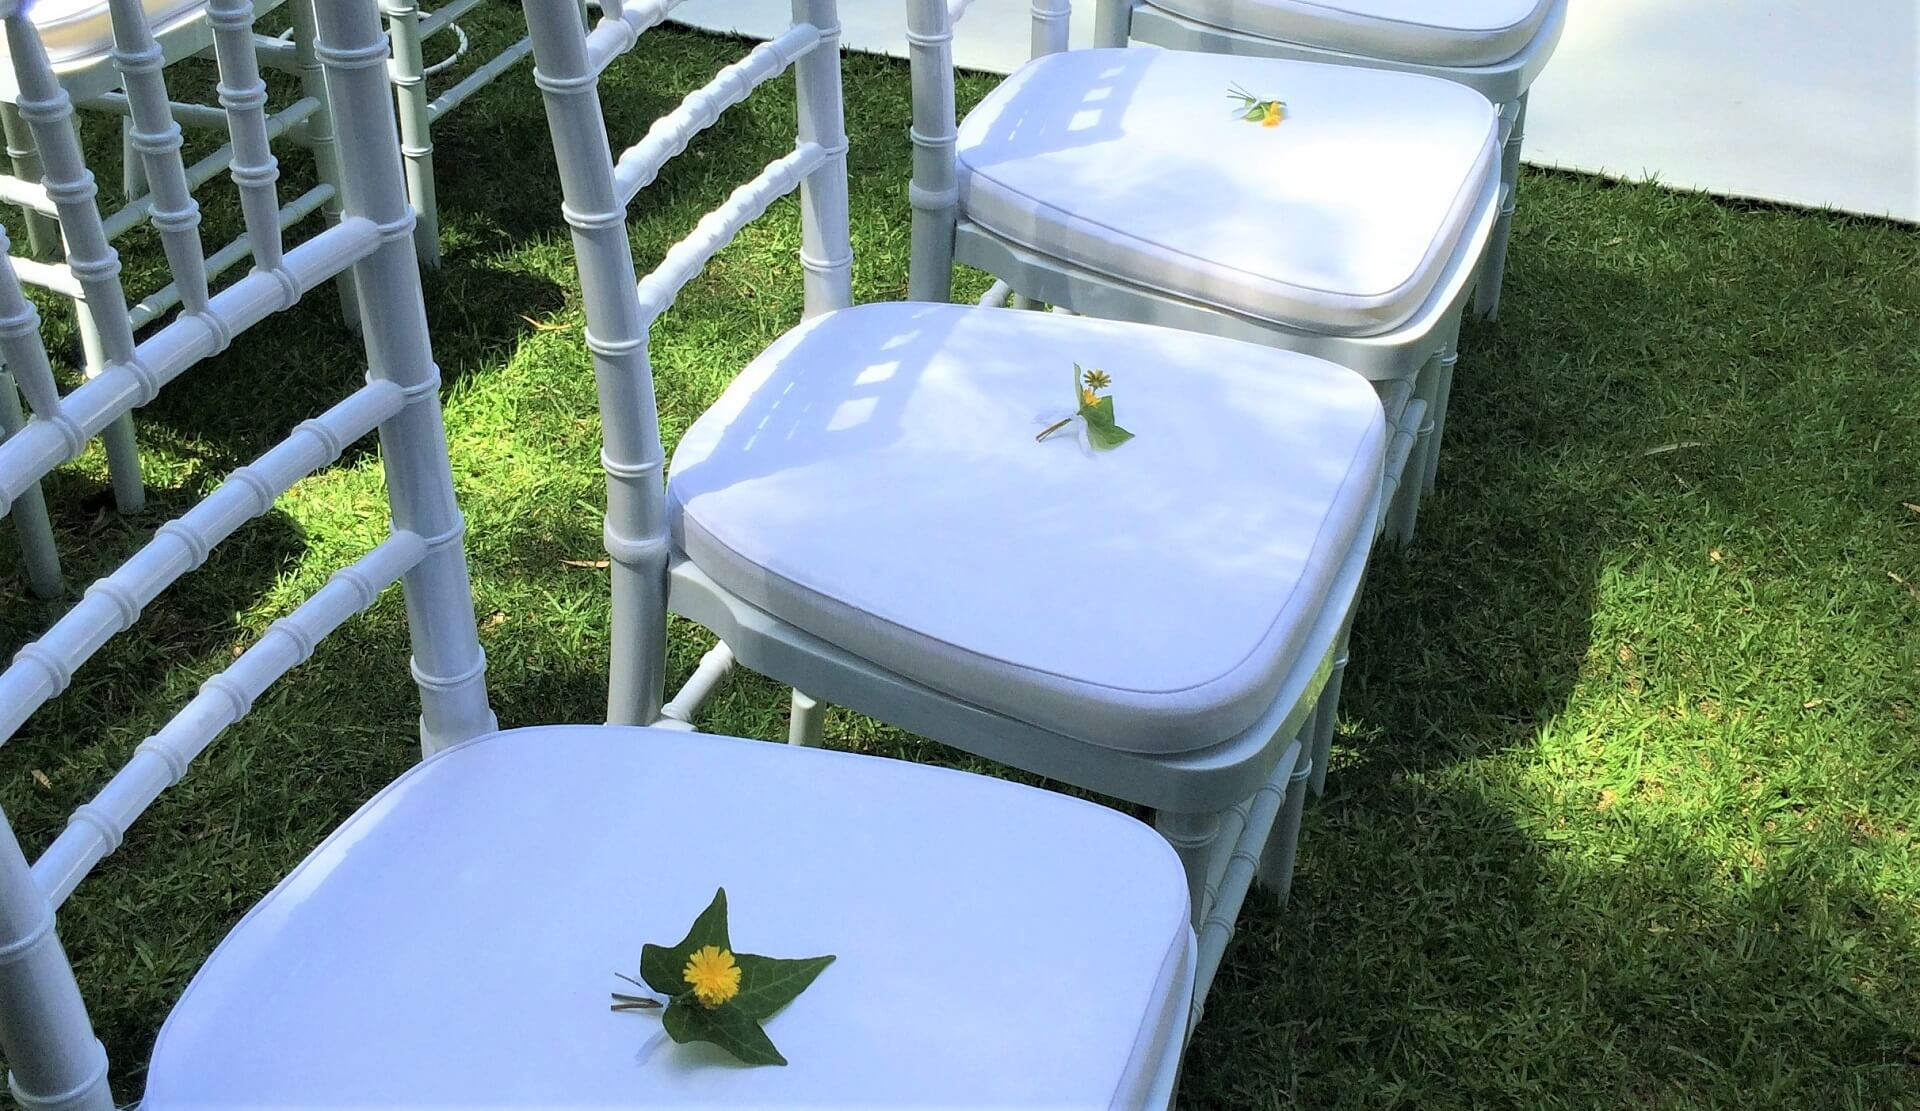 https://www.lovebirdceremonies.com.au/wp-content/uploads/2020/07/Best-wedding-tips-seating.jpg